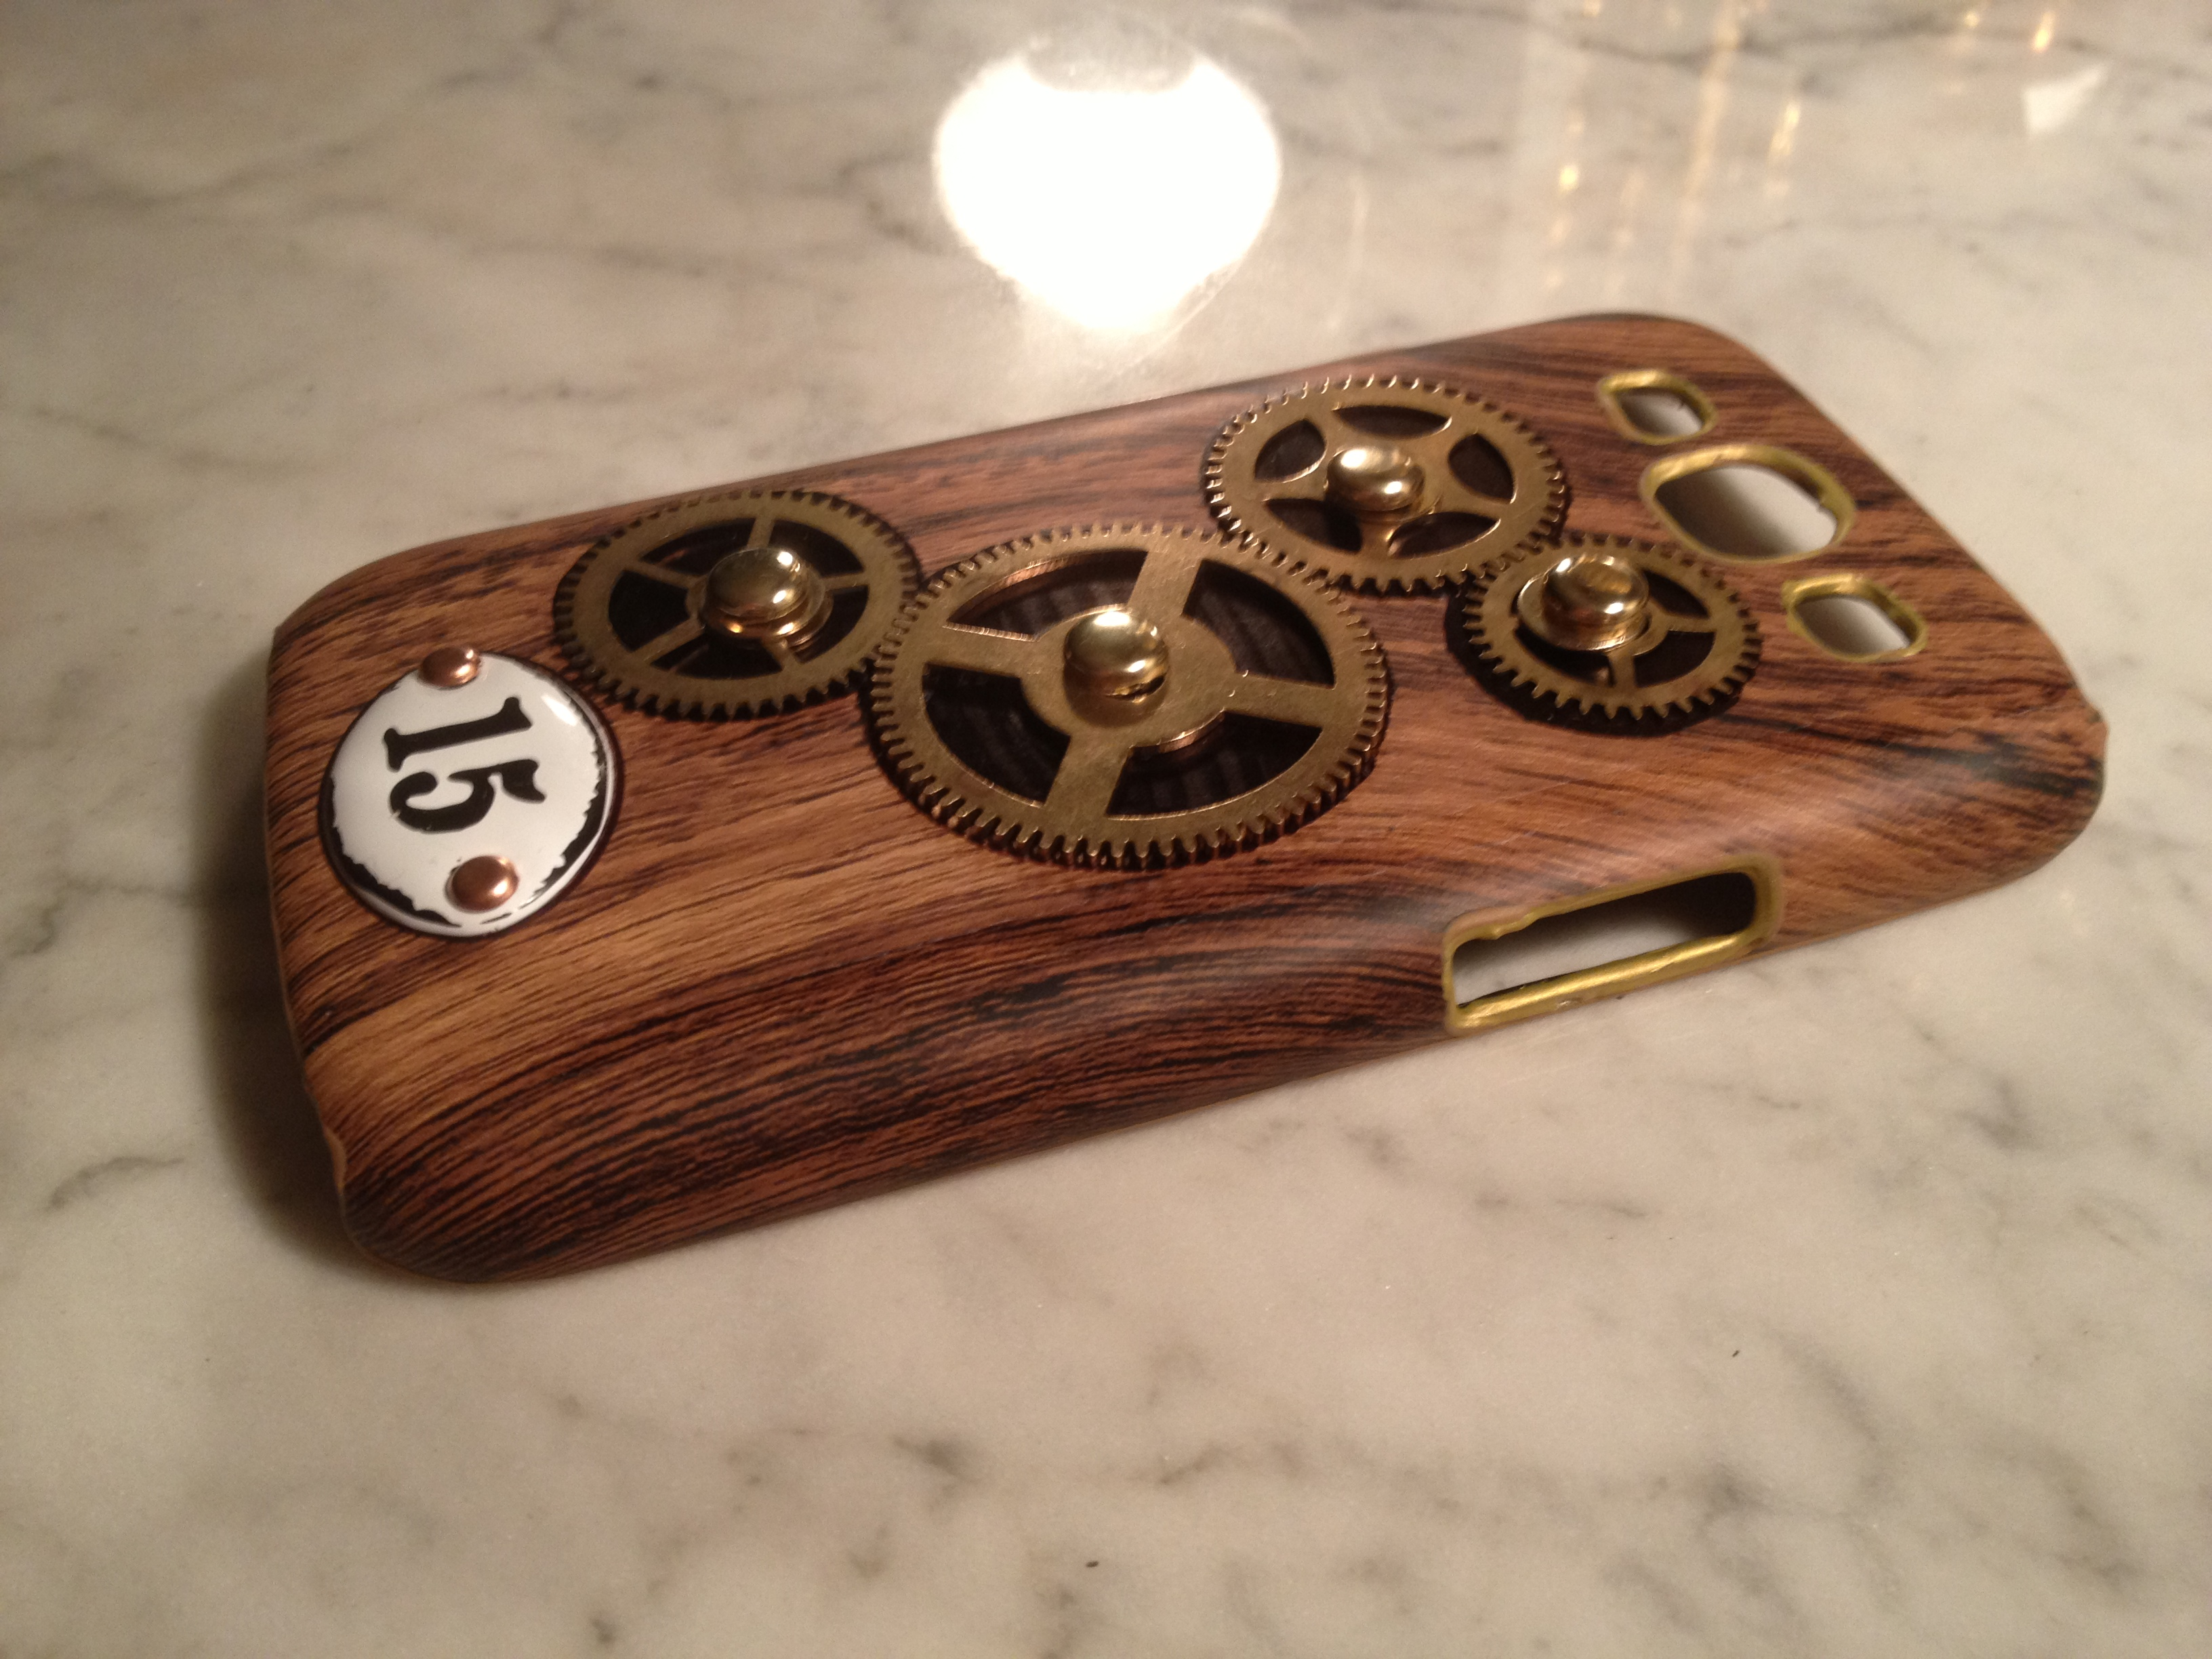 i_gearz_samsung_galaxy_s3_steampunk_phone_case_gear_spin_phone_cases_2.jpg